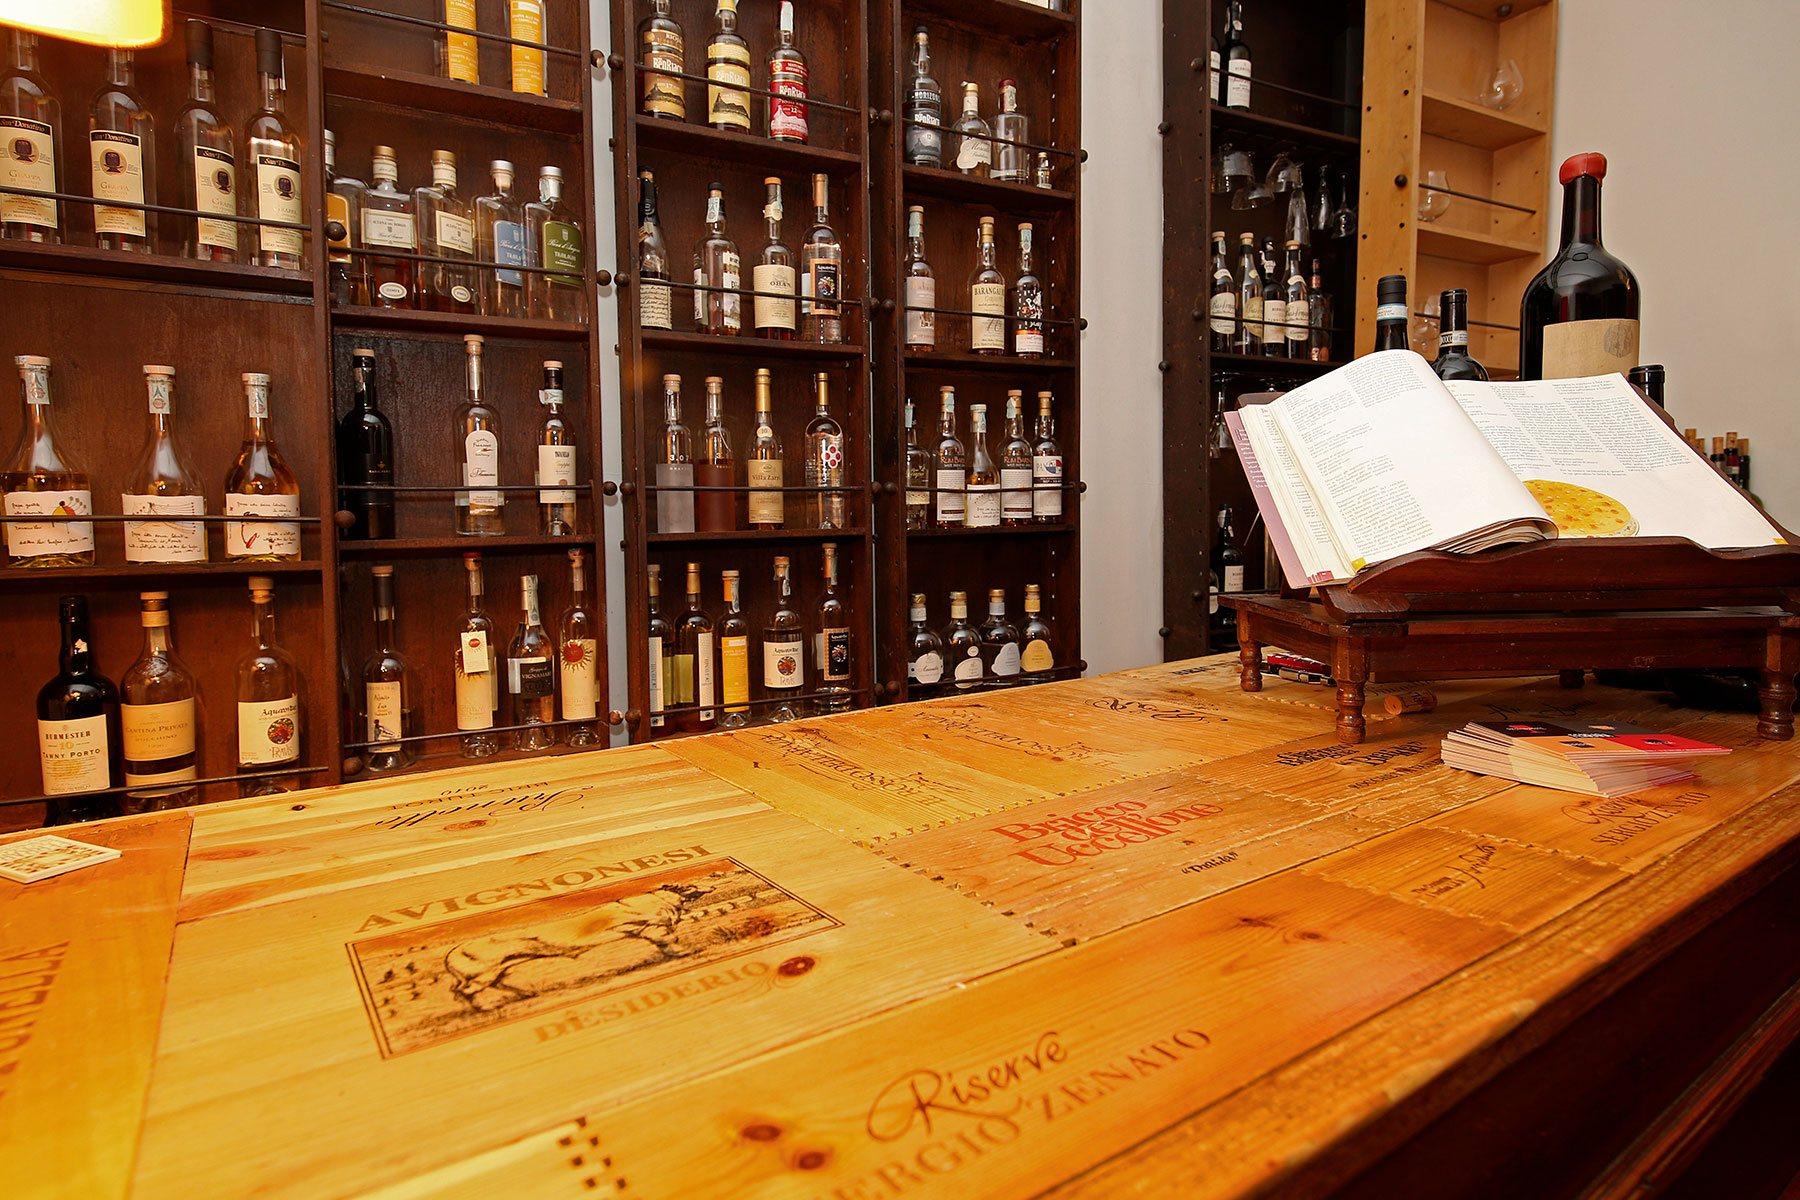 Enoteca Roma Trastevere Restaurant Osteria Wine Bar